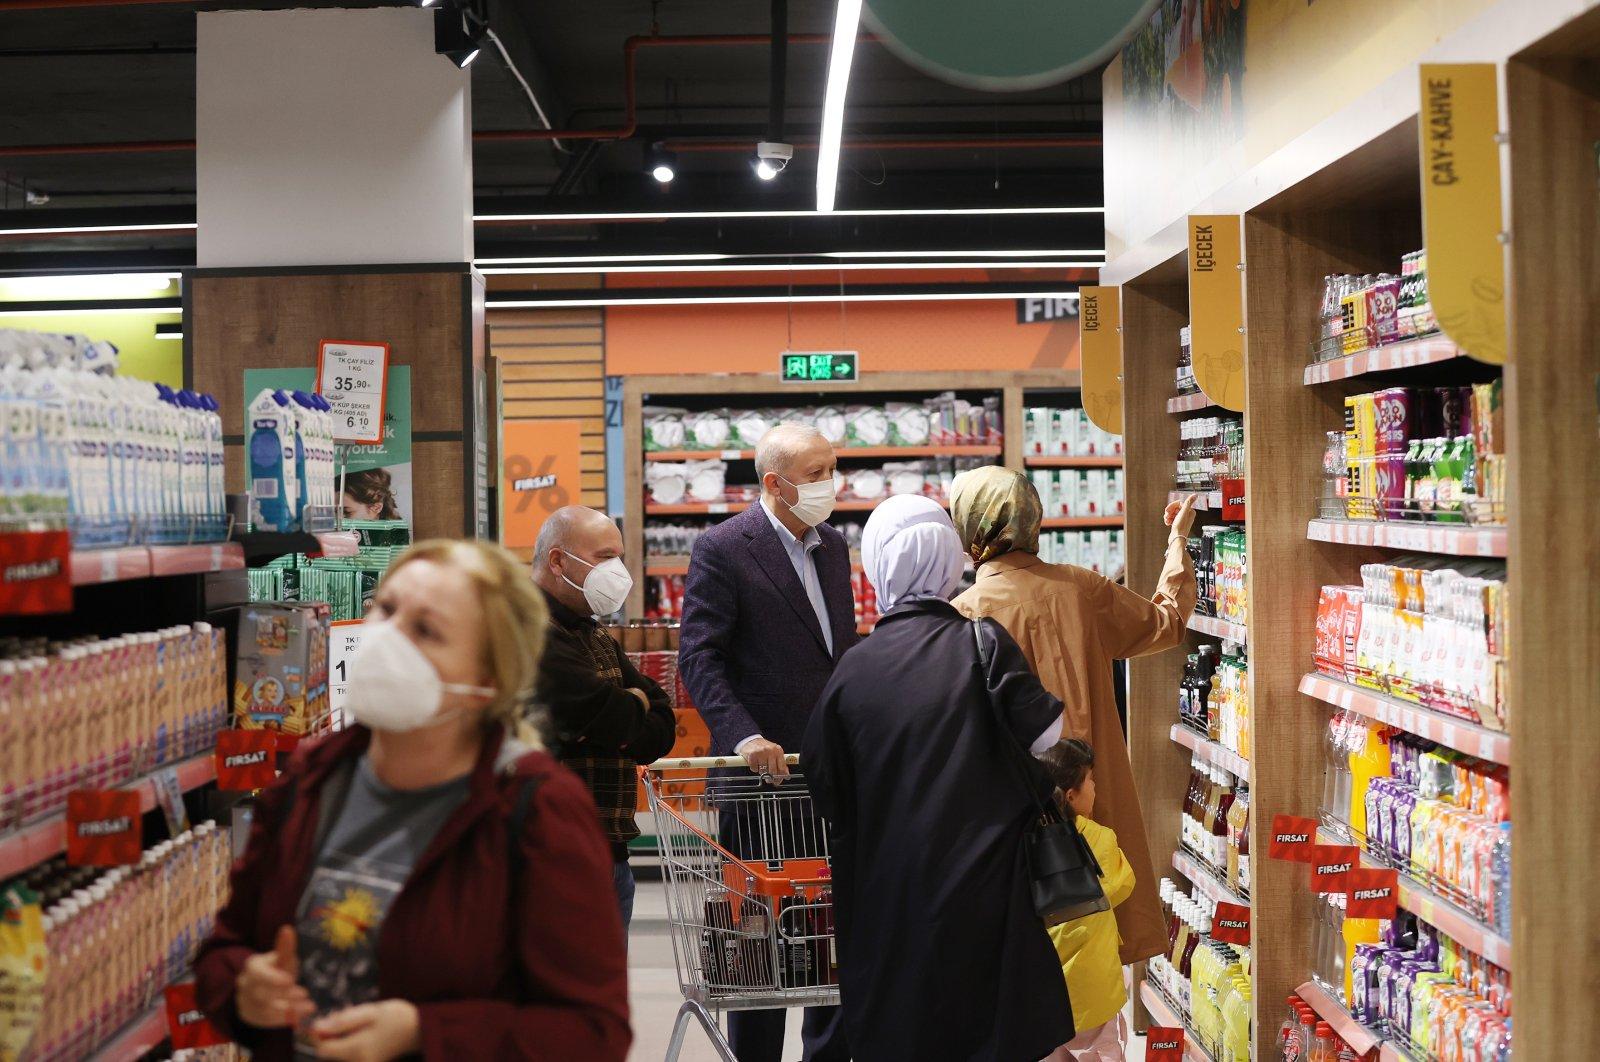 President Recep Tayyip Erdoğan (C) and First Lady Emine Erdoğan shop at an agricultural credit cooperative outlet in theKısıklıneighborhood in Istanbul's Üsküdar district, Turkey, Oct. 4, 2021.